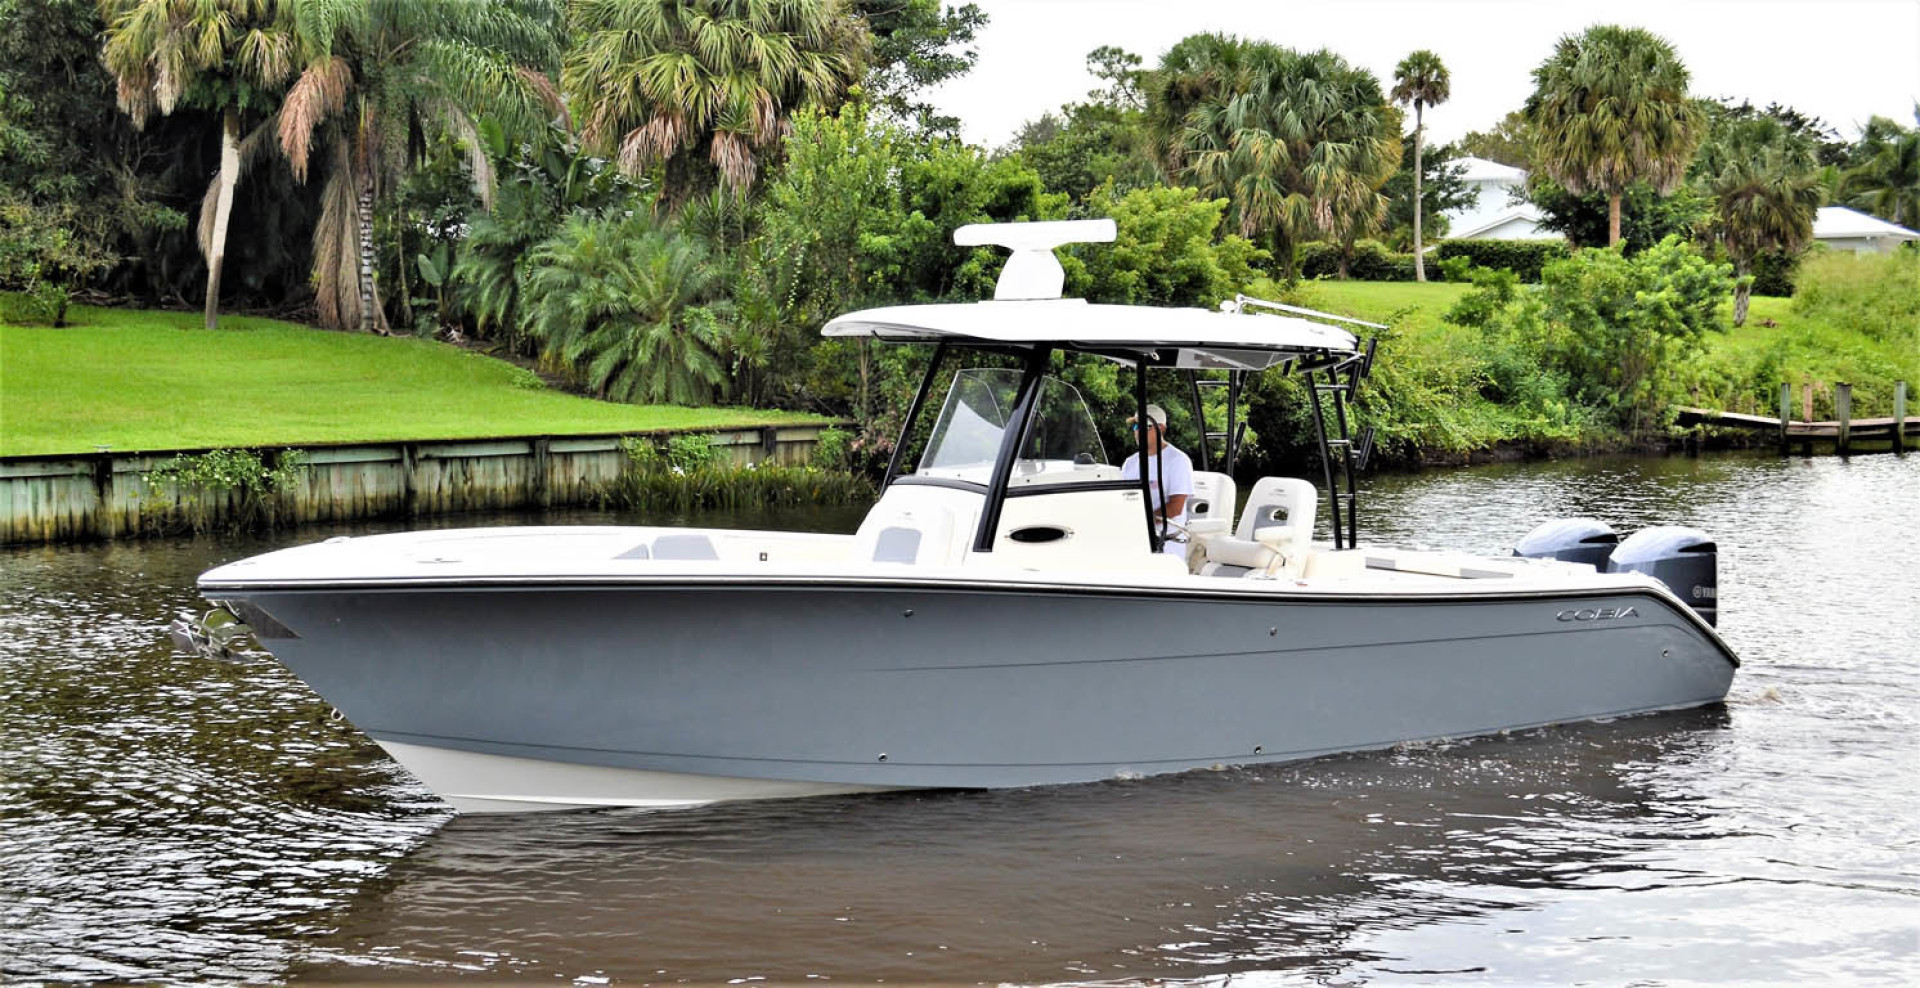 Cobia-320 CC 2019-Pivoting Palm City-Florida-United States-Cobia 320 CC-1533893 | Thumbnail